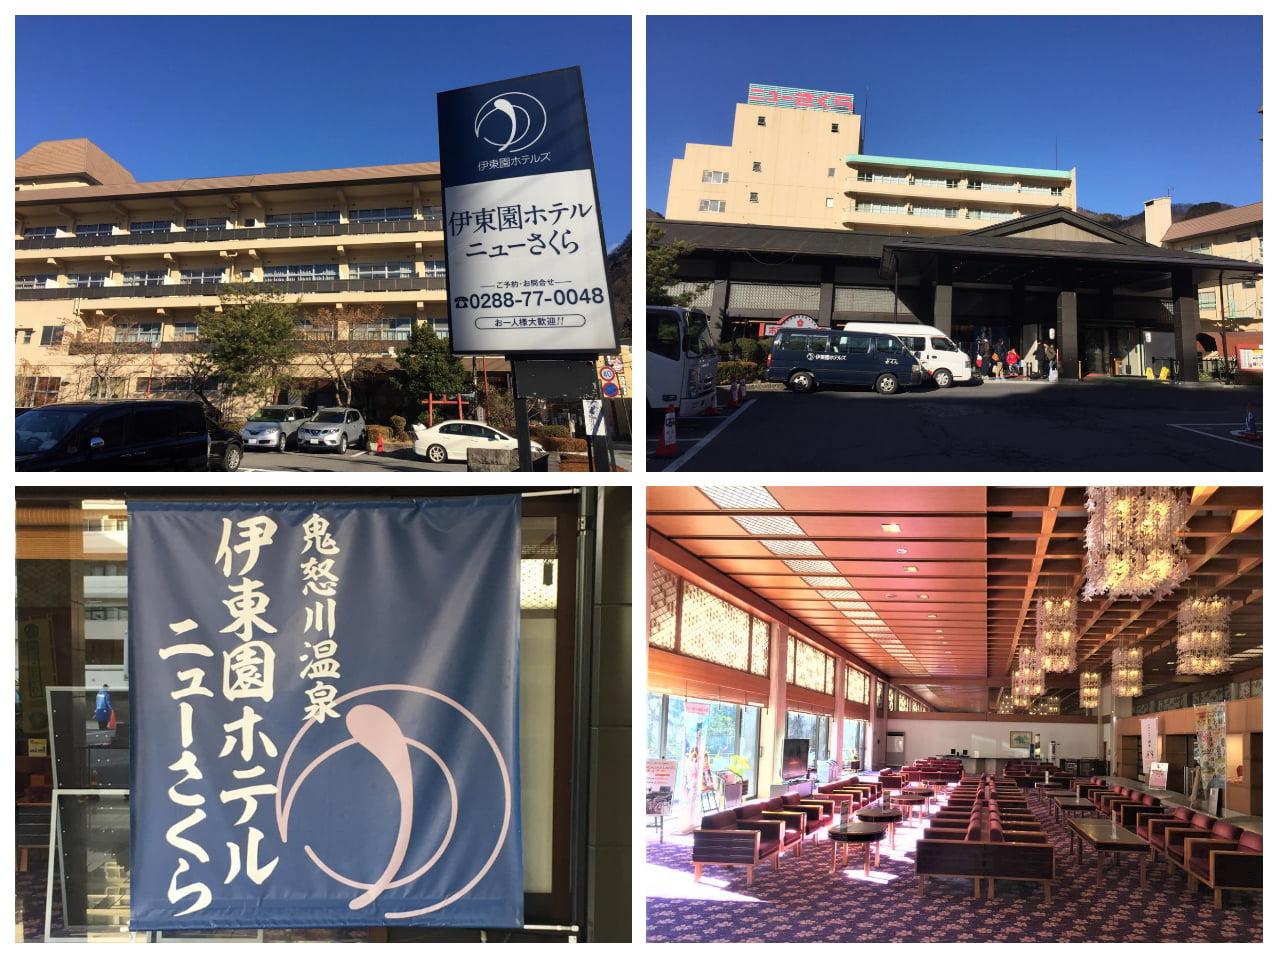 伊東園Hotel New Sakura